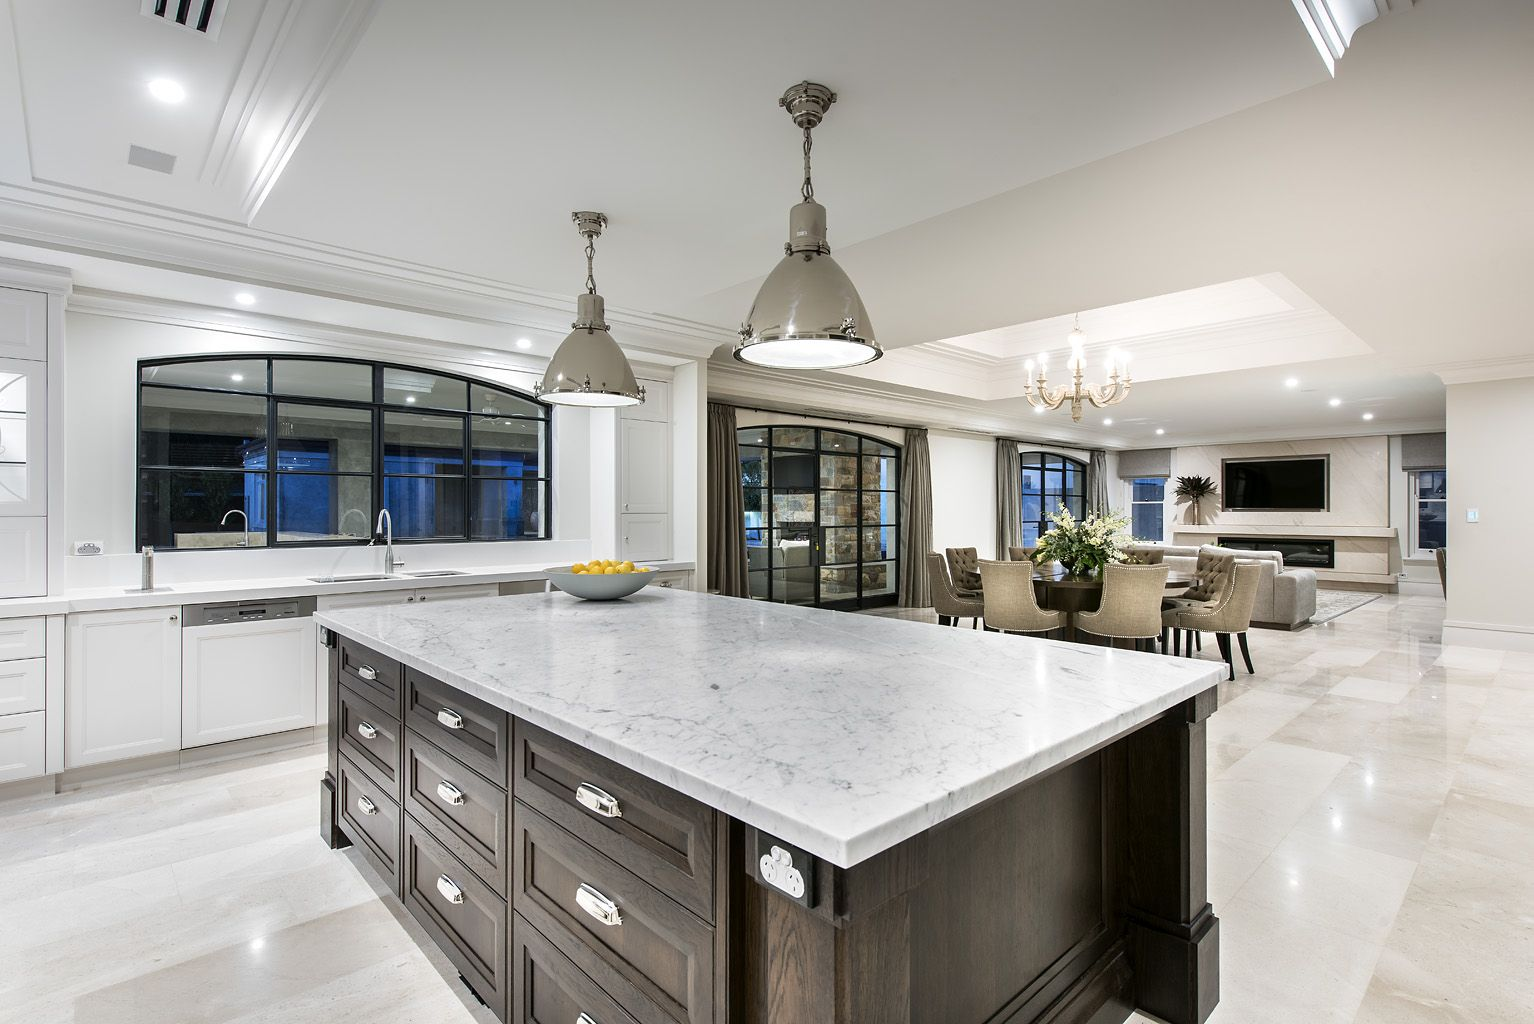 Zorzi | Custom Luxury Home | Kitchens | Pinterest | Luxury, Perth ...